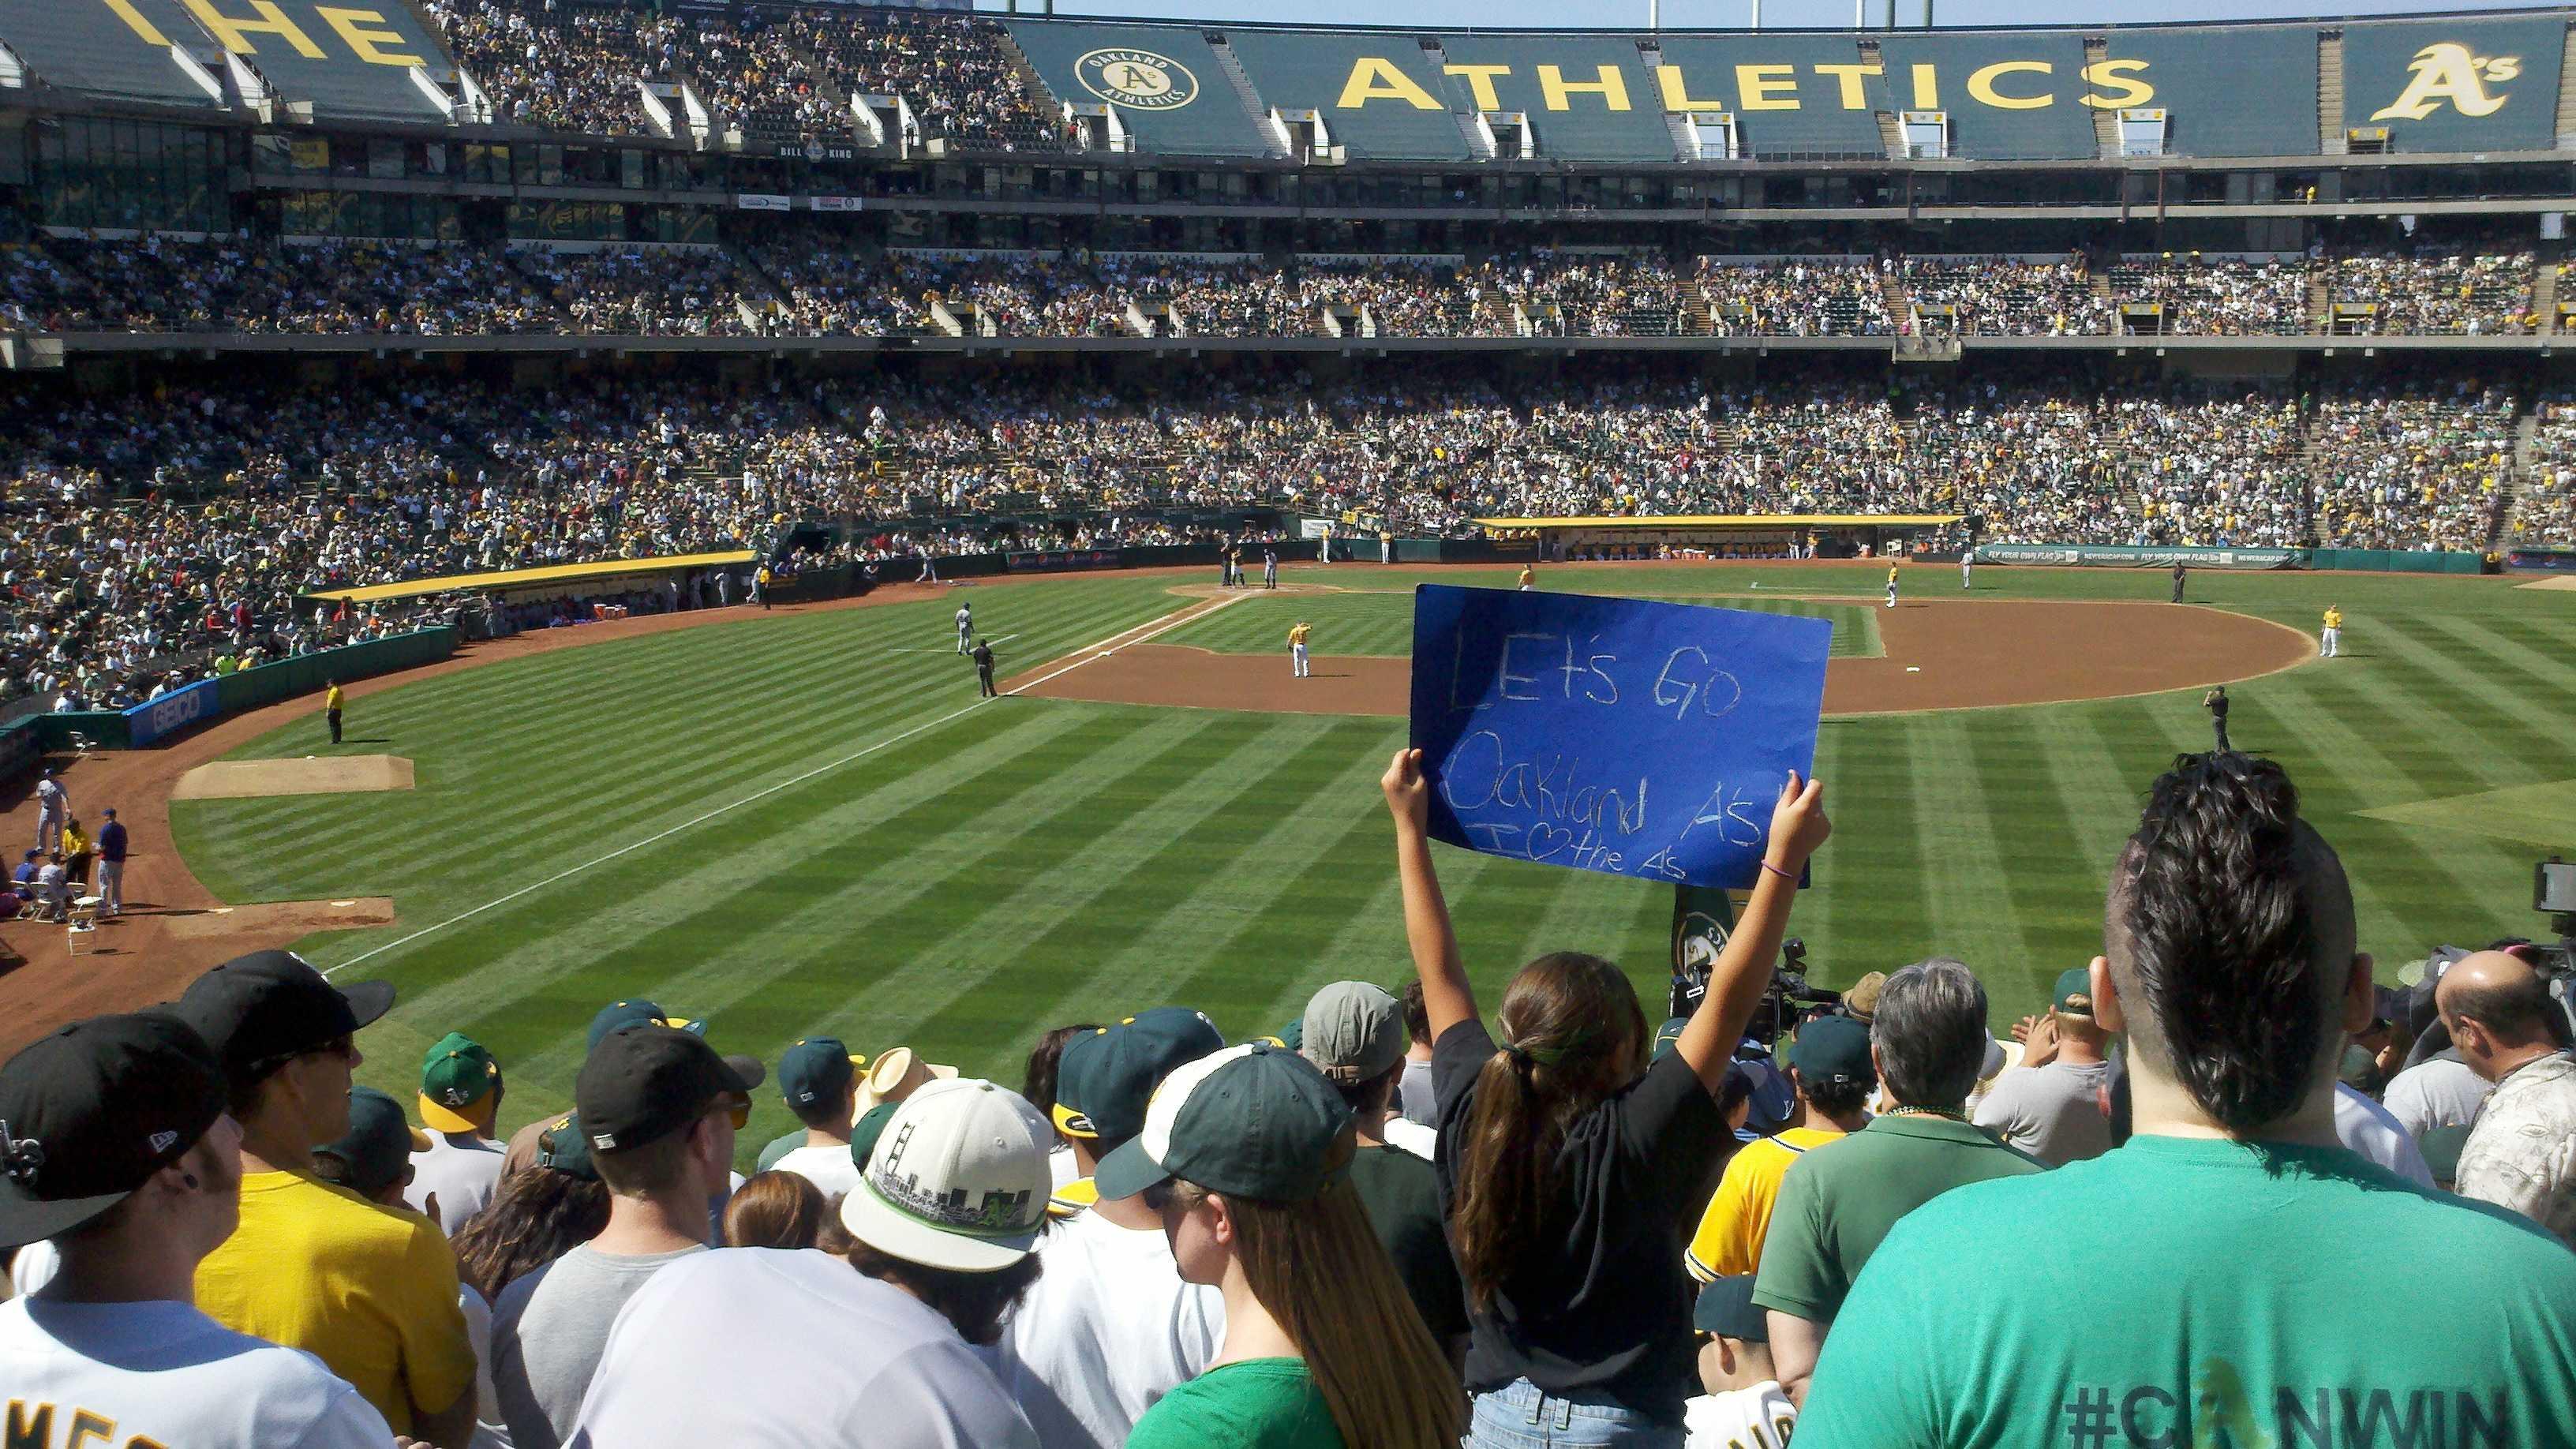 Oakland stands